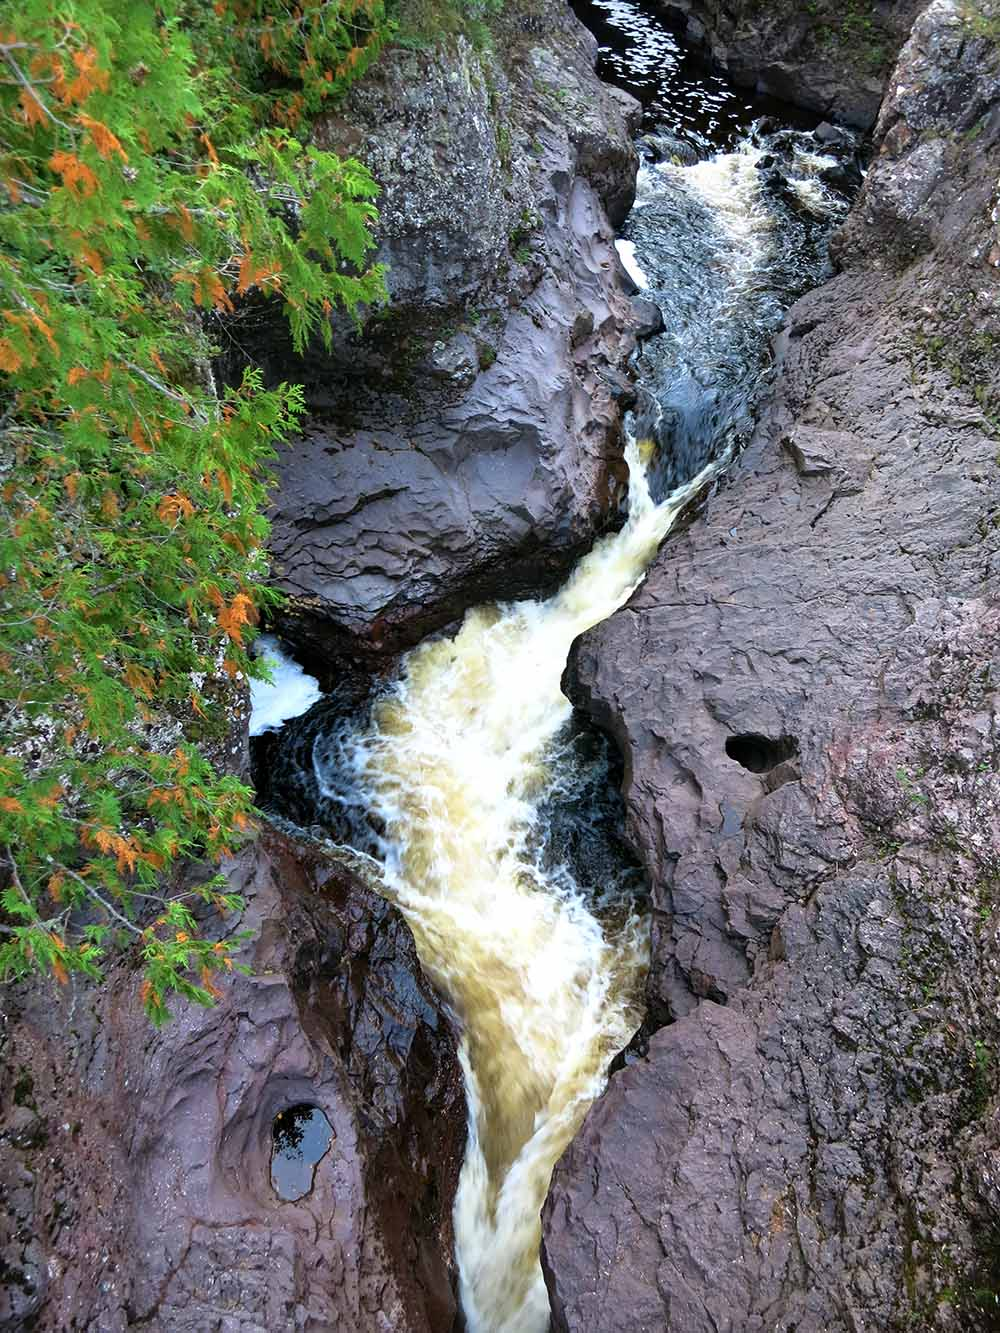 10 Waterfalls on Minnesota's North Shore - Temperance river gorge - Minnesota waterfalls